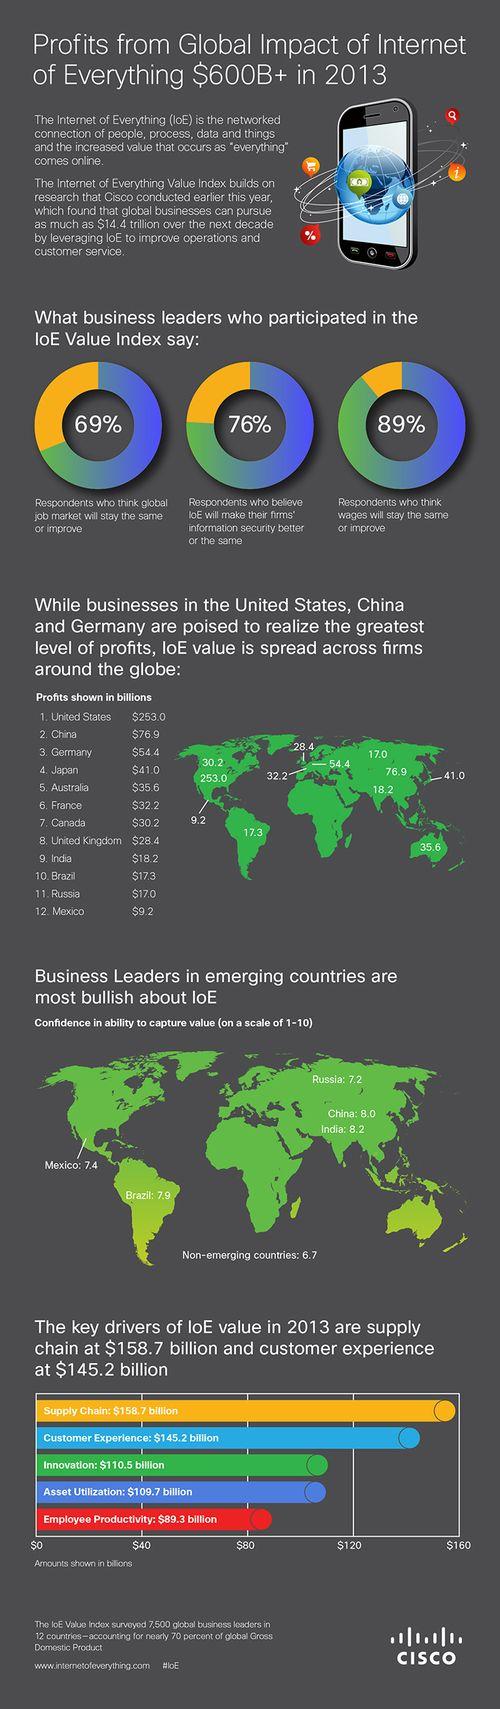 IIoE-Infographic-final_700x2392